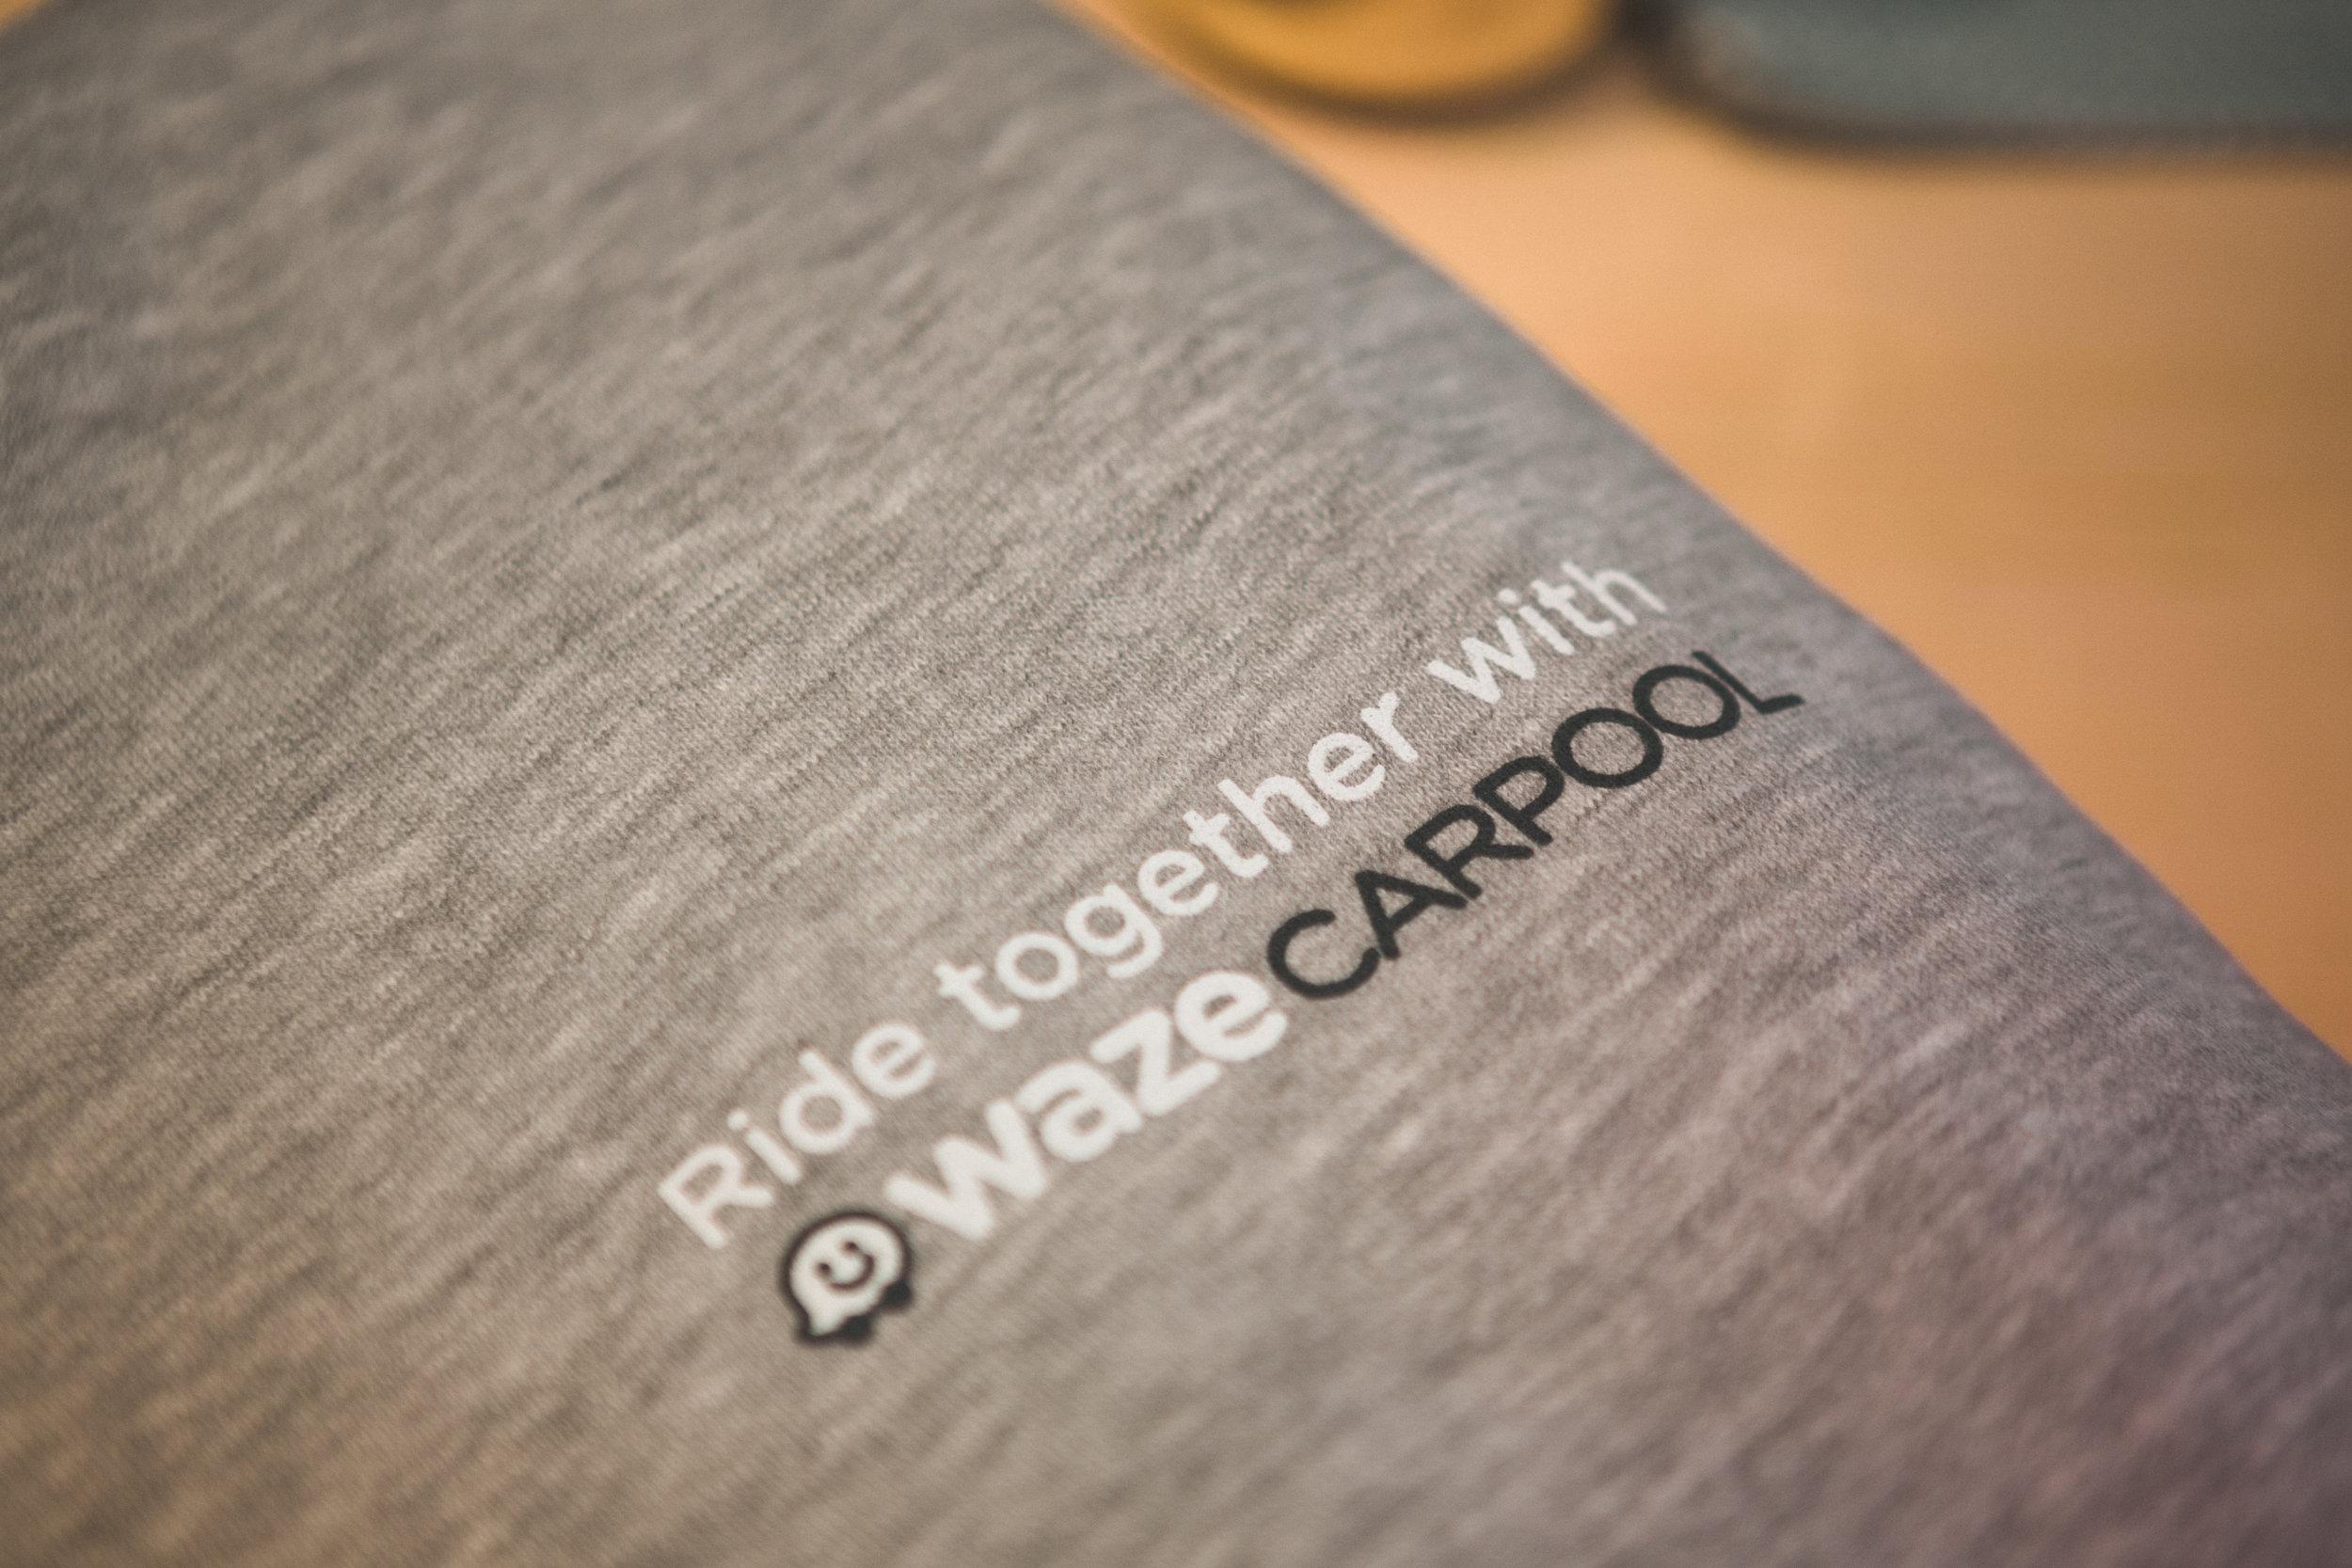 Waze Carpool  Experiential Marketing Event Photography Agency Brand Photography Brand Videography  Experiential Activations O Hello Media